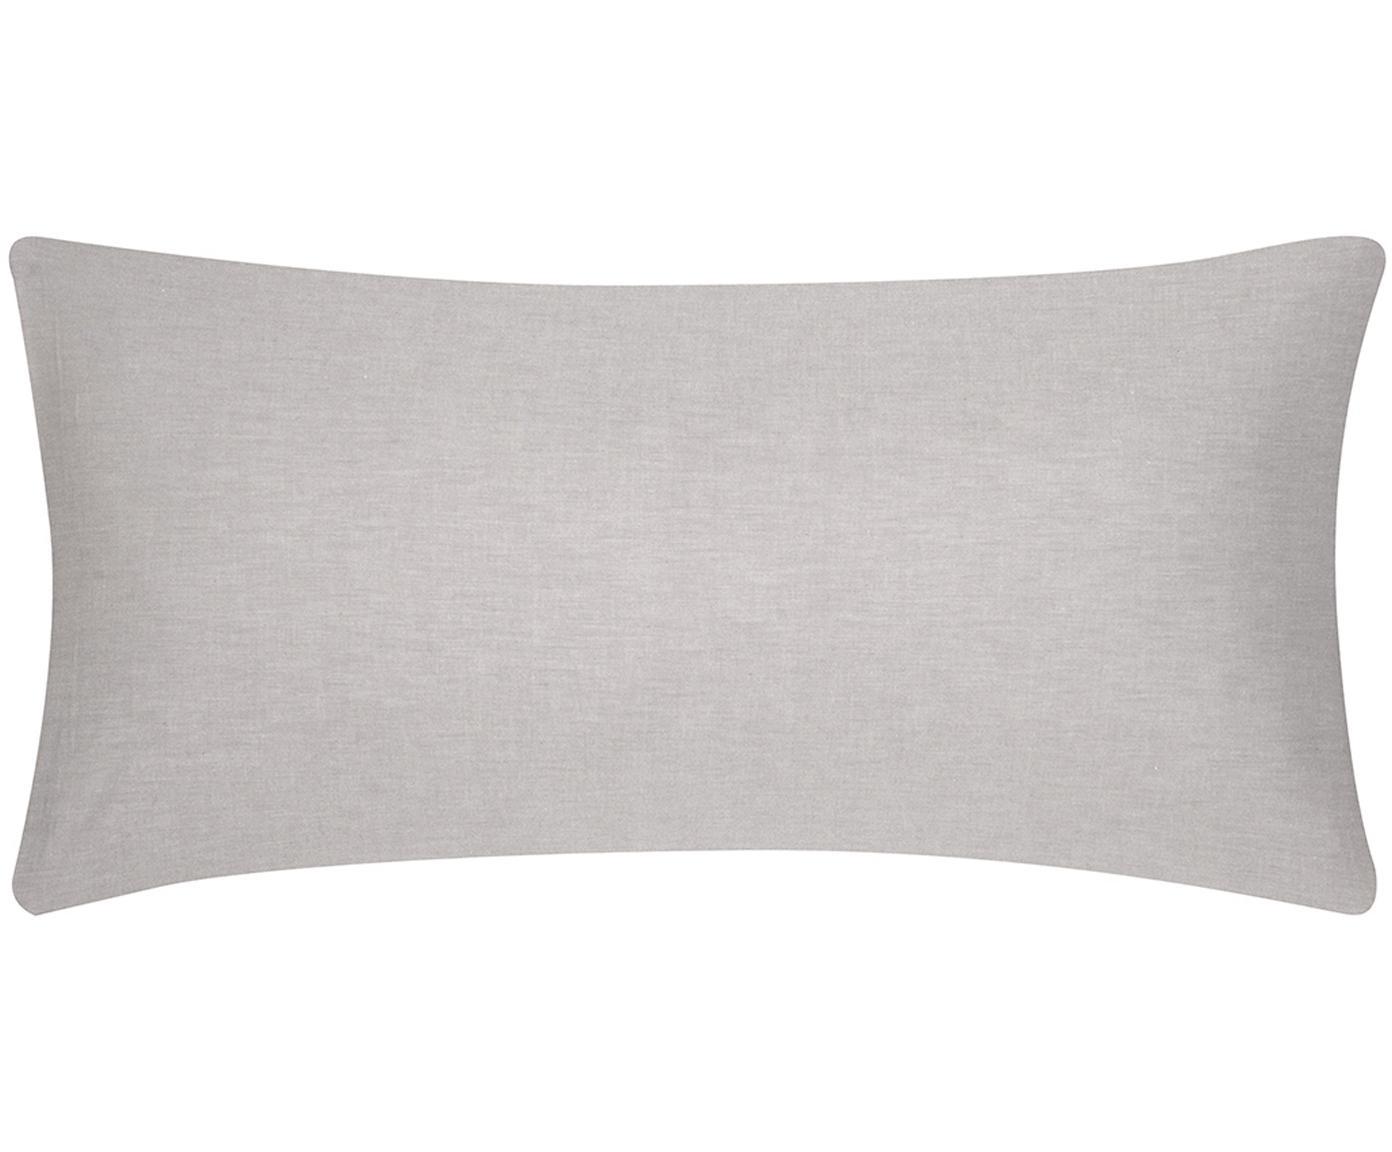 Poszewka na poduszkę Cashmere, 2 szt., Beżowy, S 40 x D 80 cm